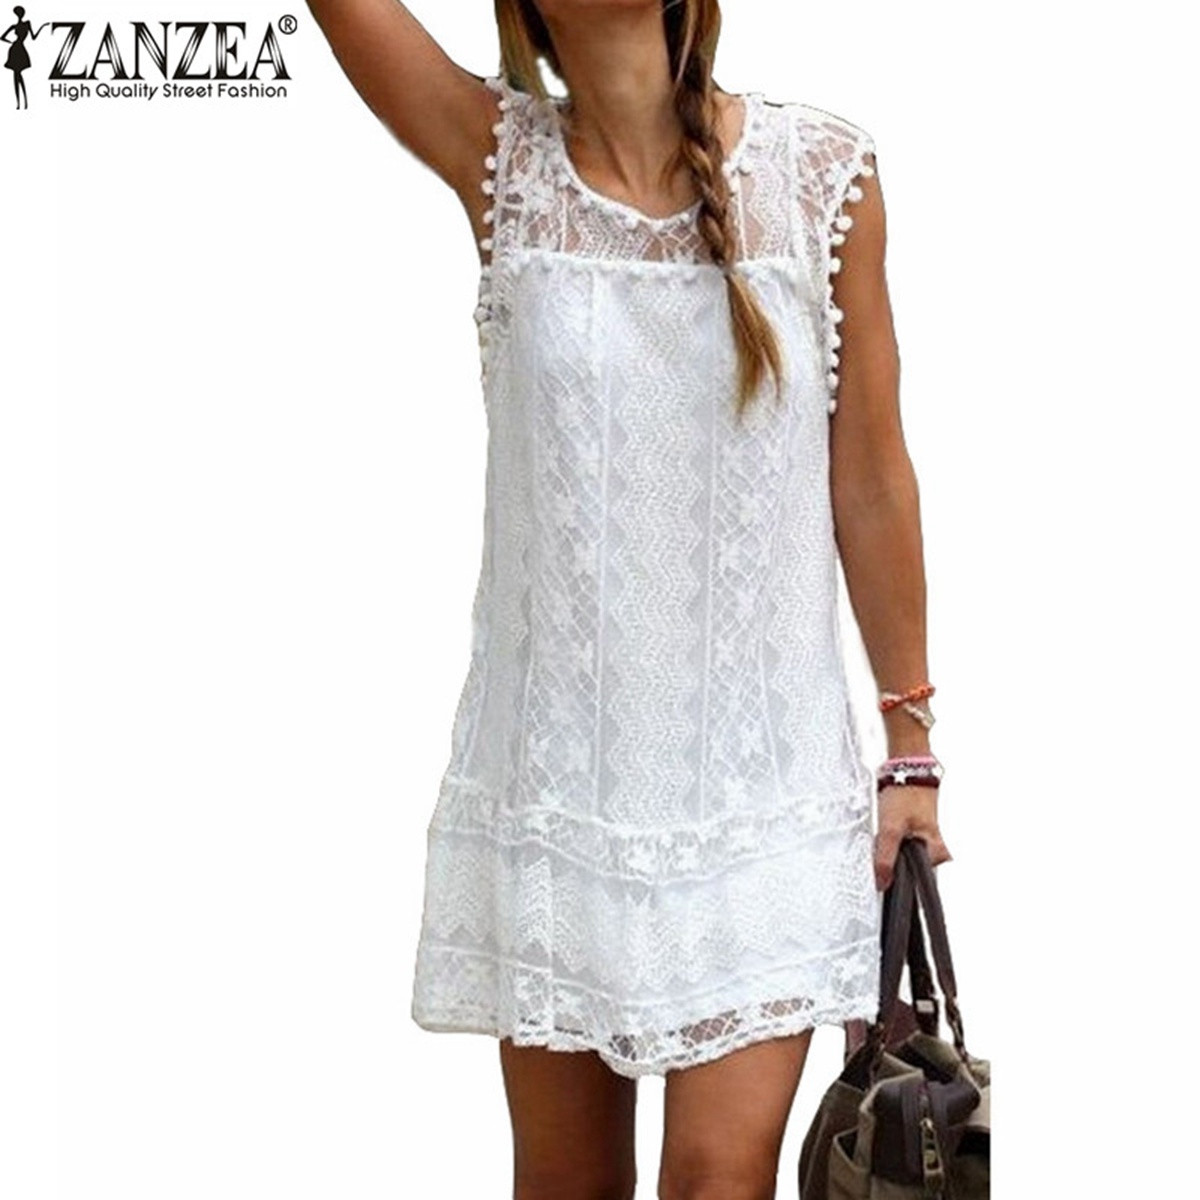 Navy short lace mini summer dress dresses elegant party vestidos brand - Zanzea Vestidos 2017 Summer Elegant Women Casual Solid Short Sleeve Slim Lace Mini Dress Tops Ladies